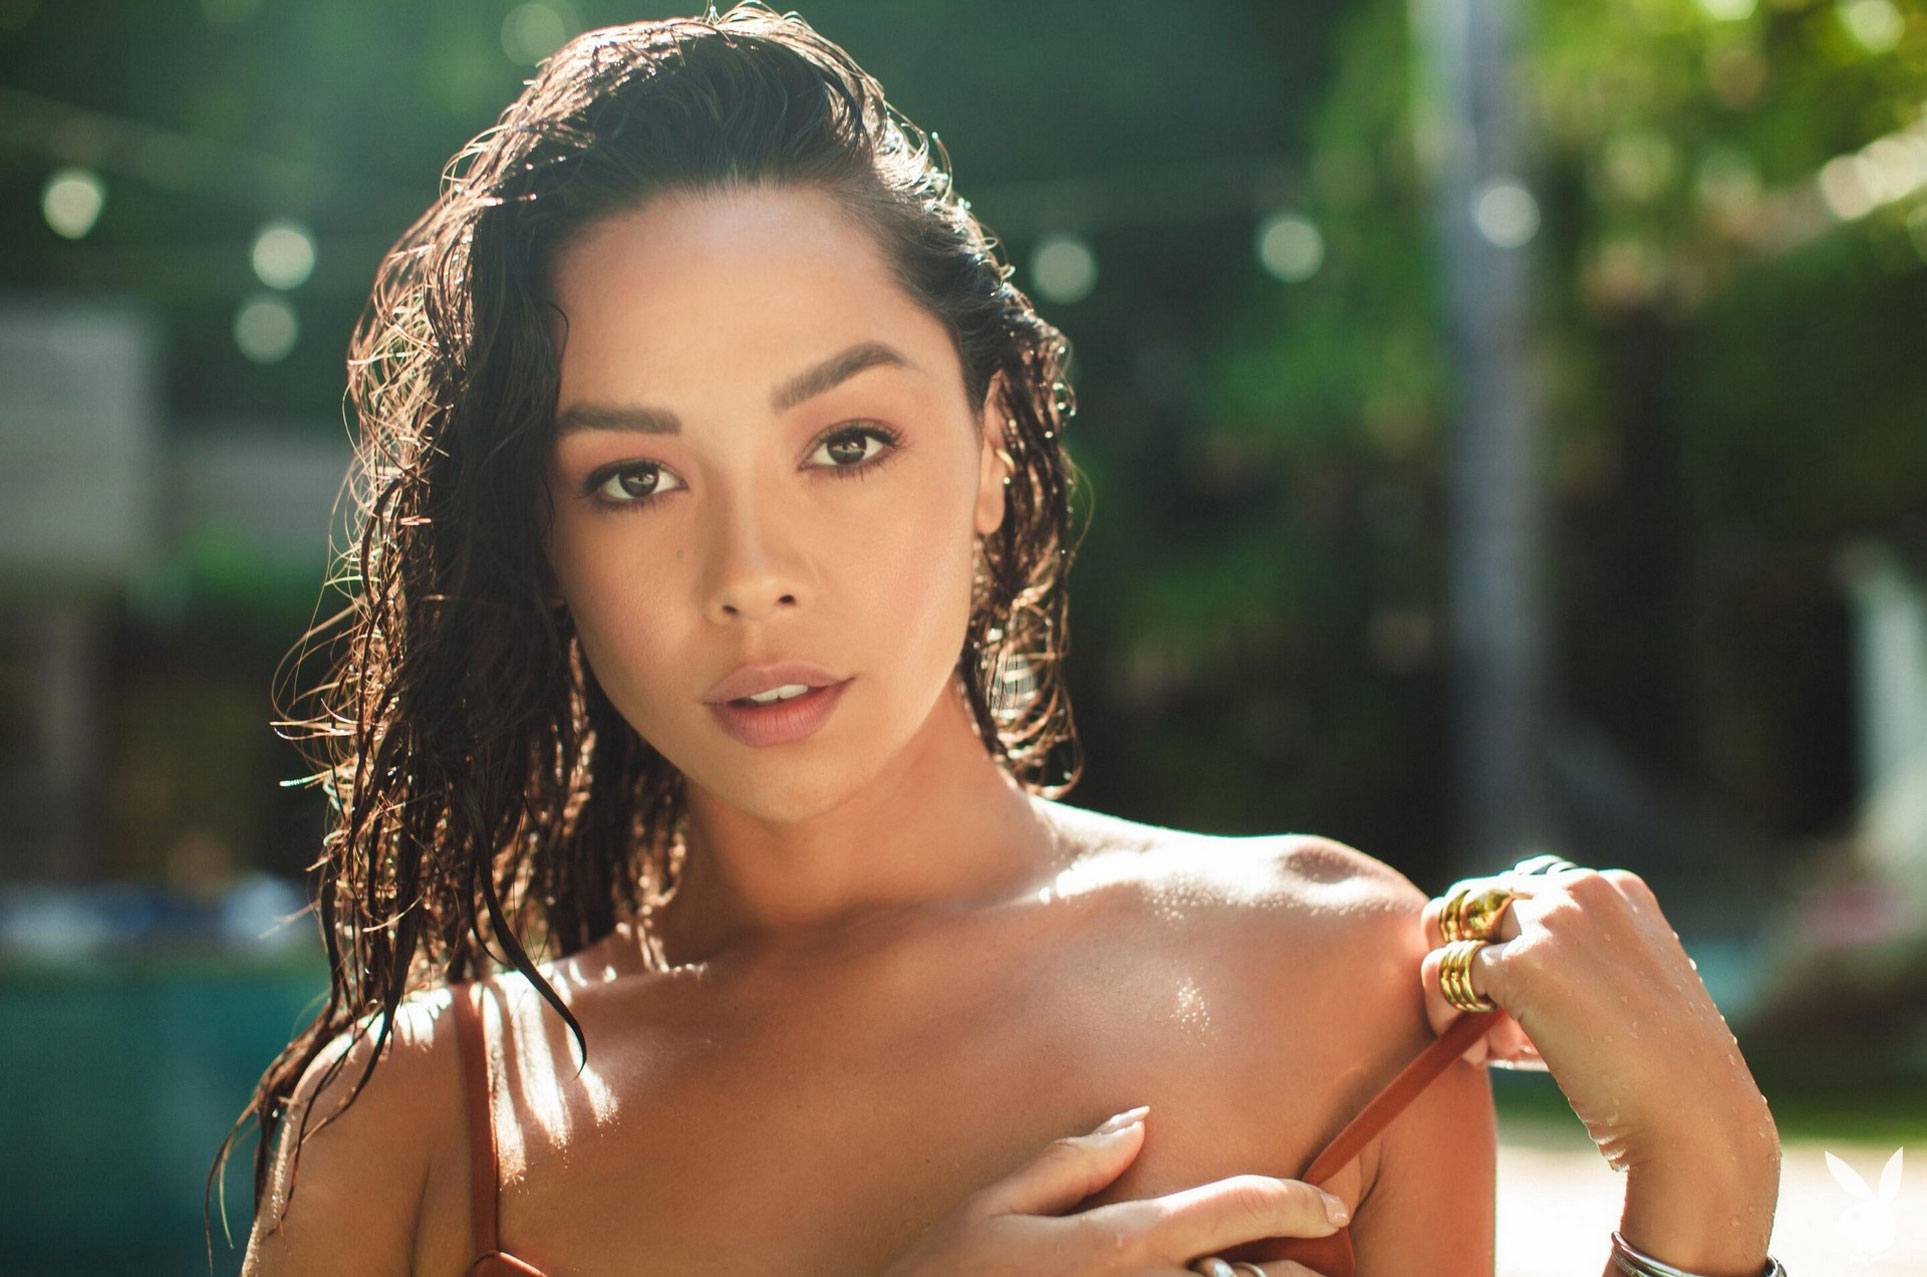 Девушка месяца Даниэлла Алькараз, Playboy США сентябрь 2020 / фото 14